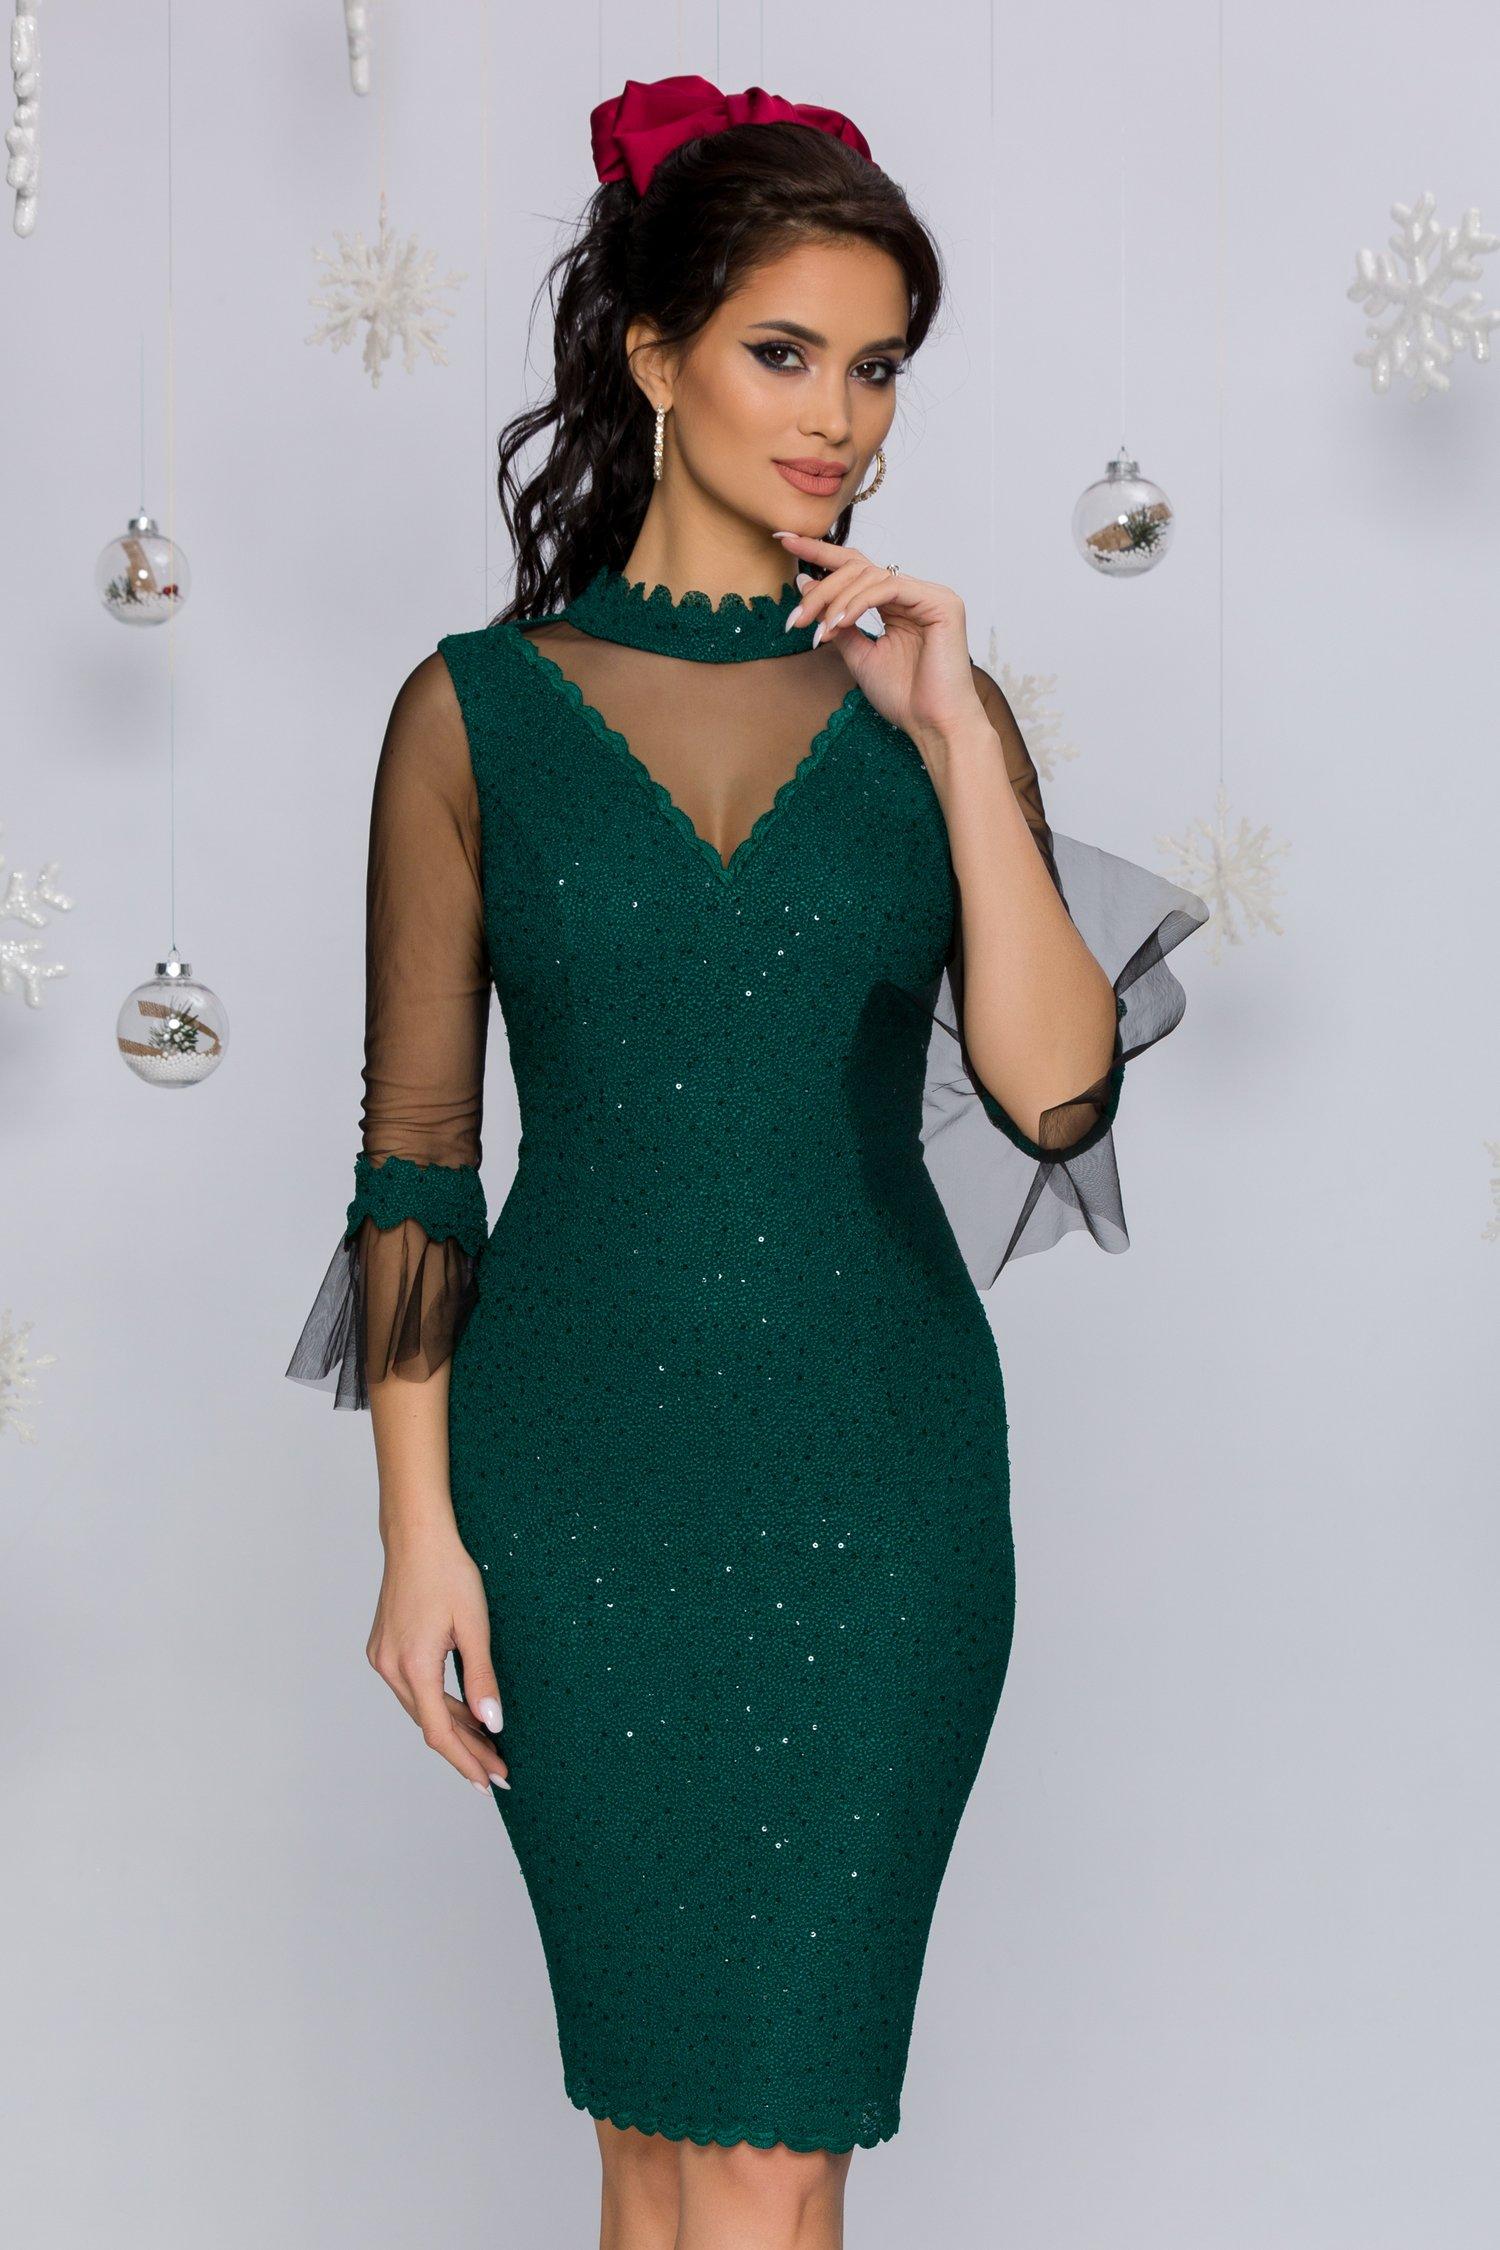 Rochie Leonard Collection verde smarald accesorizata cu tull si paiete